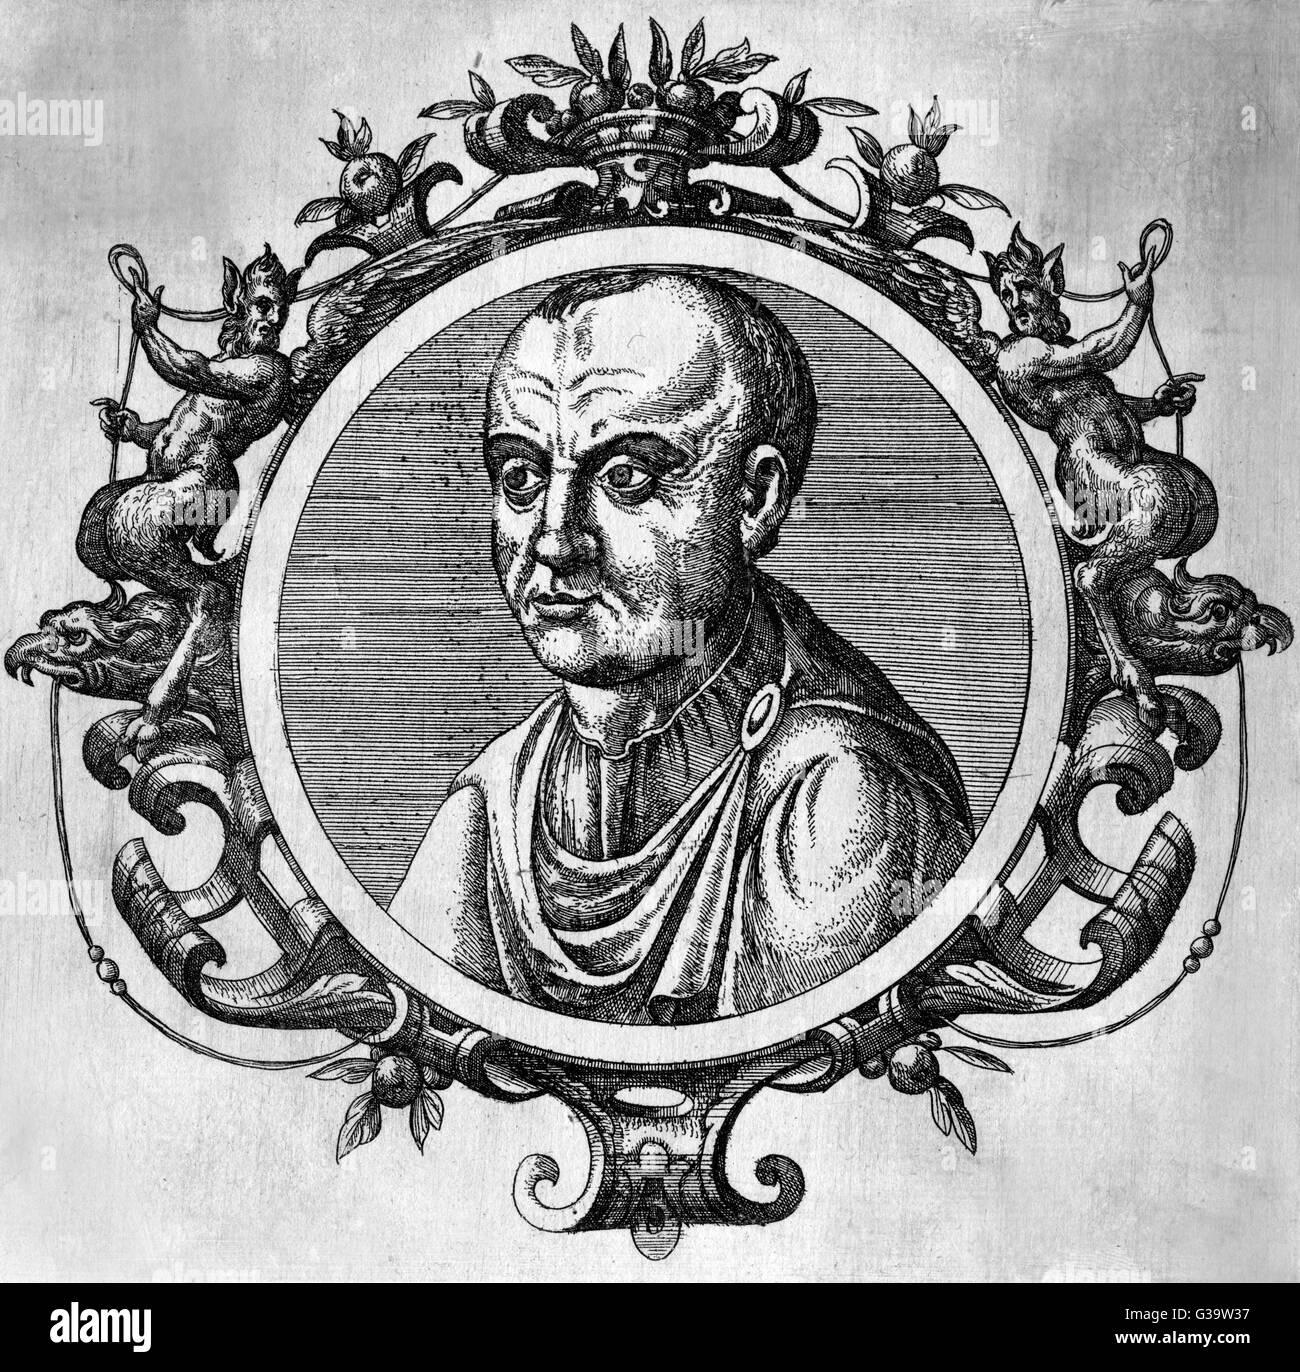 Héraclius de Tarente Empereur de l'Empire romain Date: 575 - 641 Photo Stock